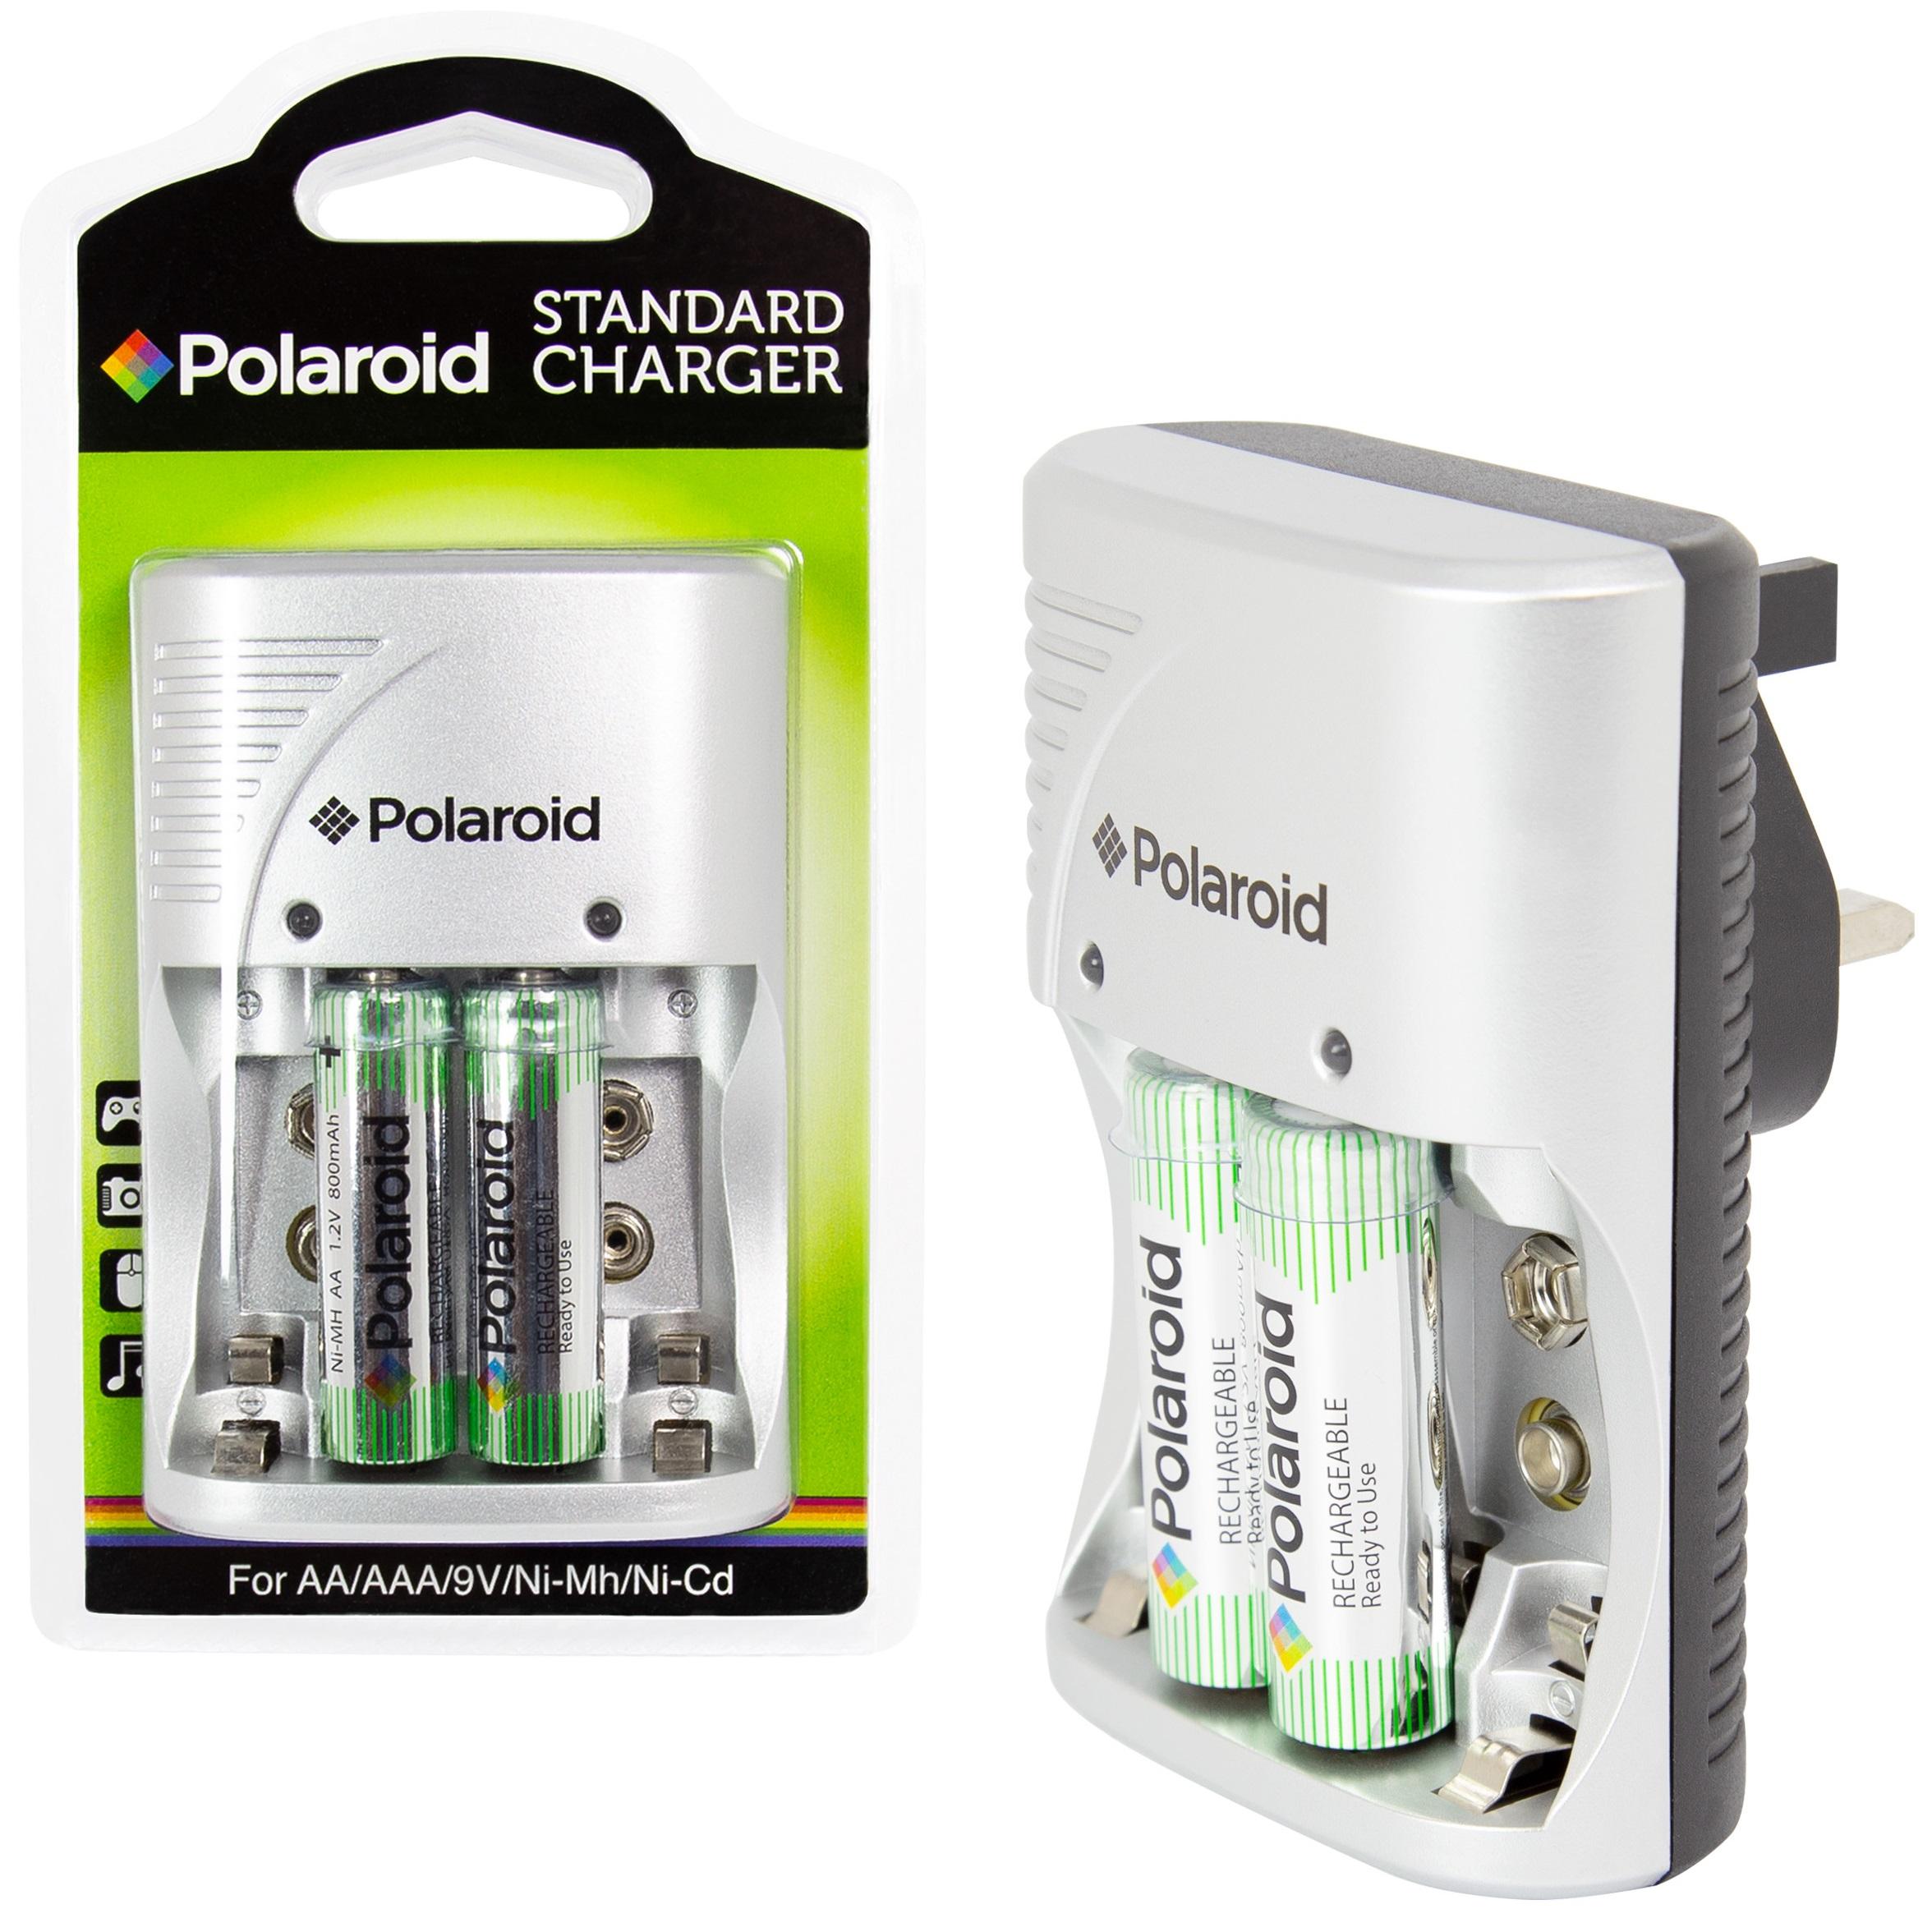 EU Plug Standard Power Charger for AA//AAA//9V//Ni-MH//Ni-Cd Rechargeable Battery